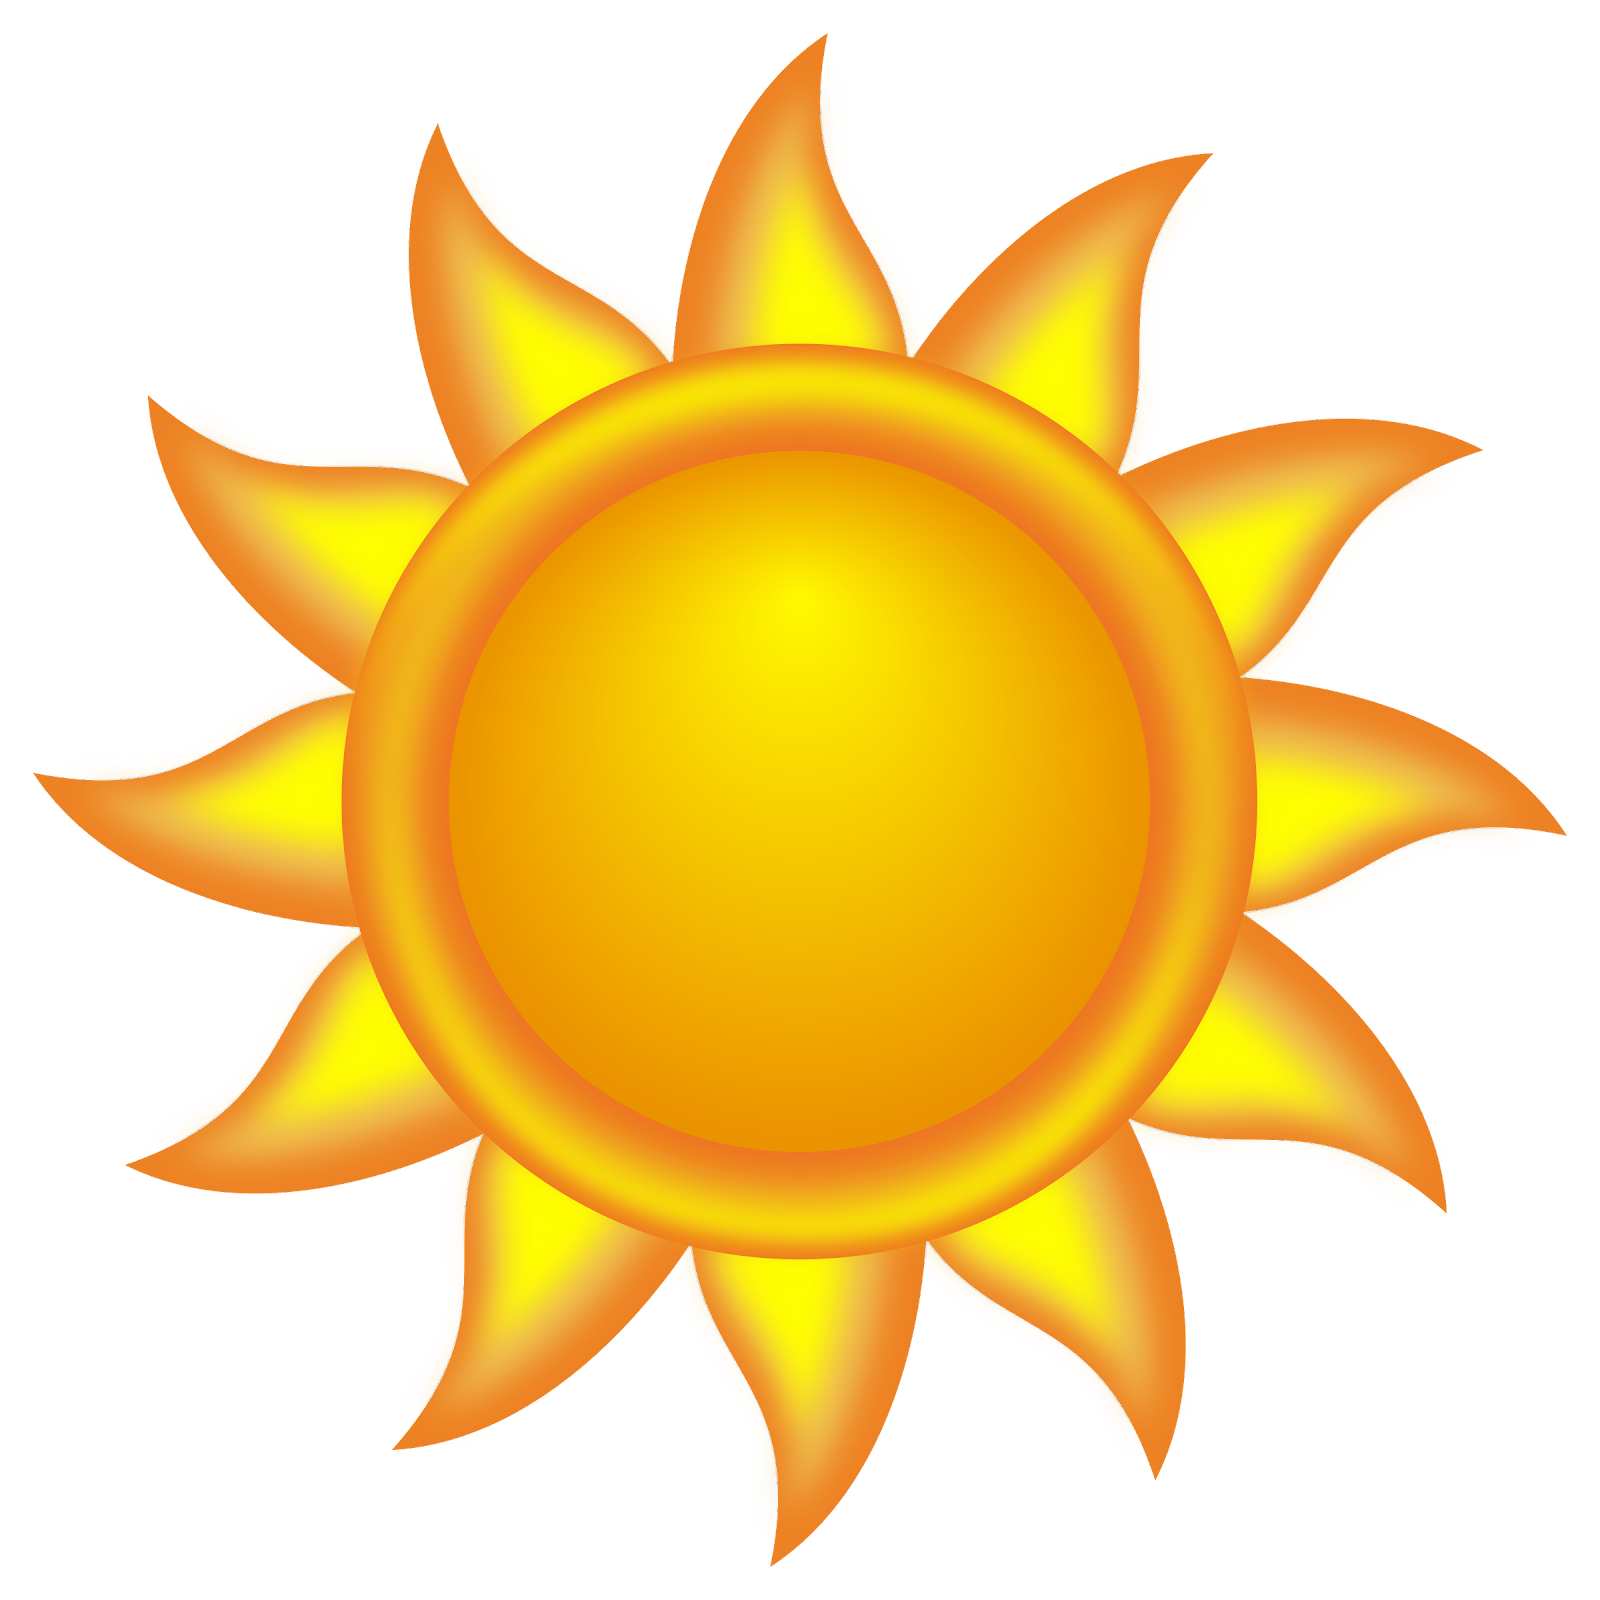 https://www.goodfreephotos.com/albums/vector-images/cartoon-sun-vector-art.png